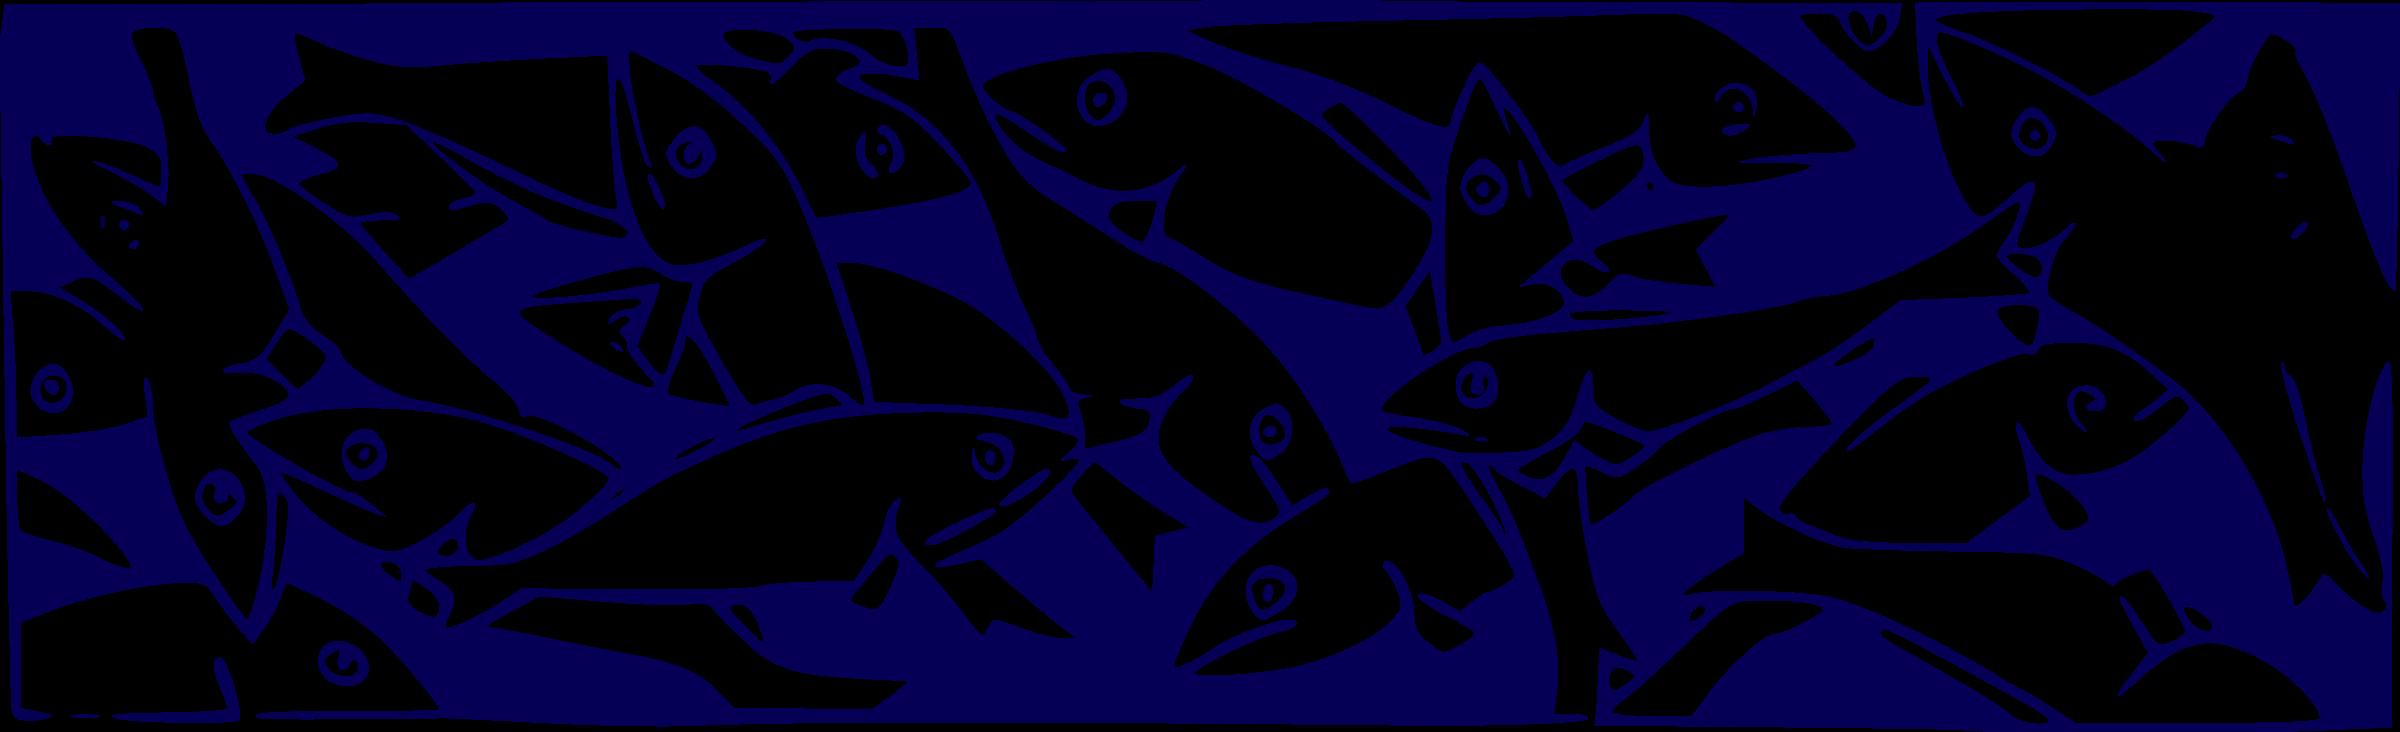 Fish in net clipart. Sardin fishing big image